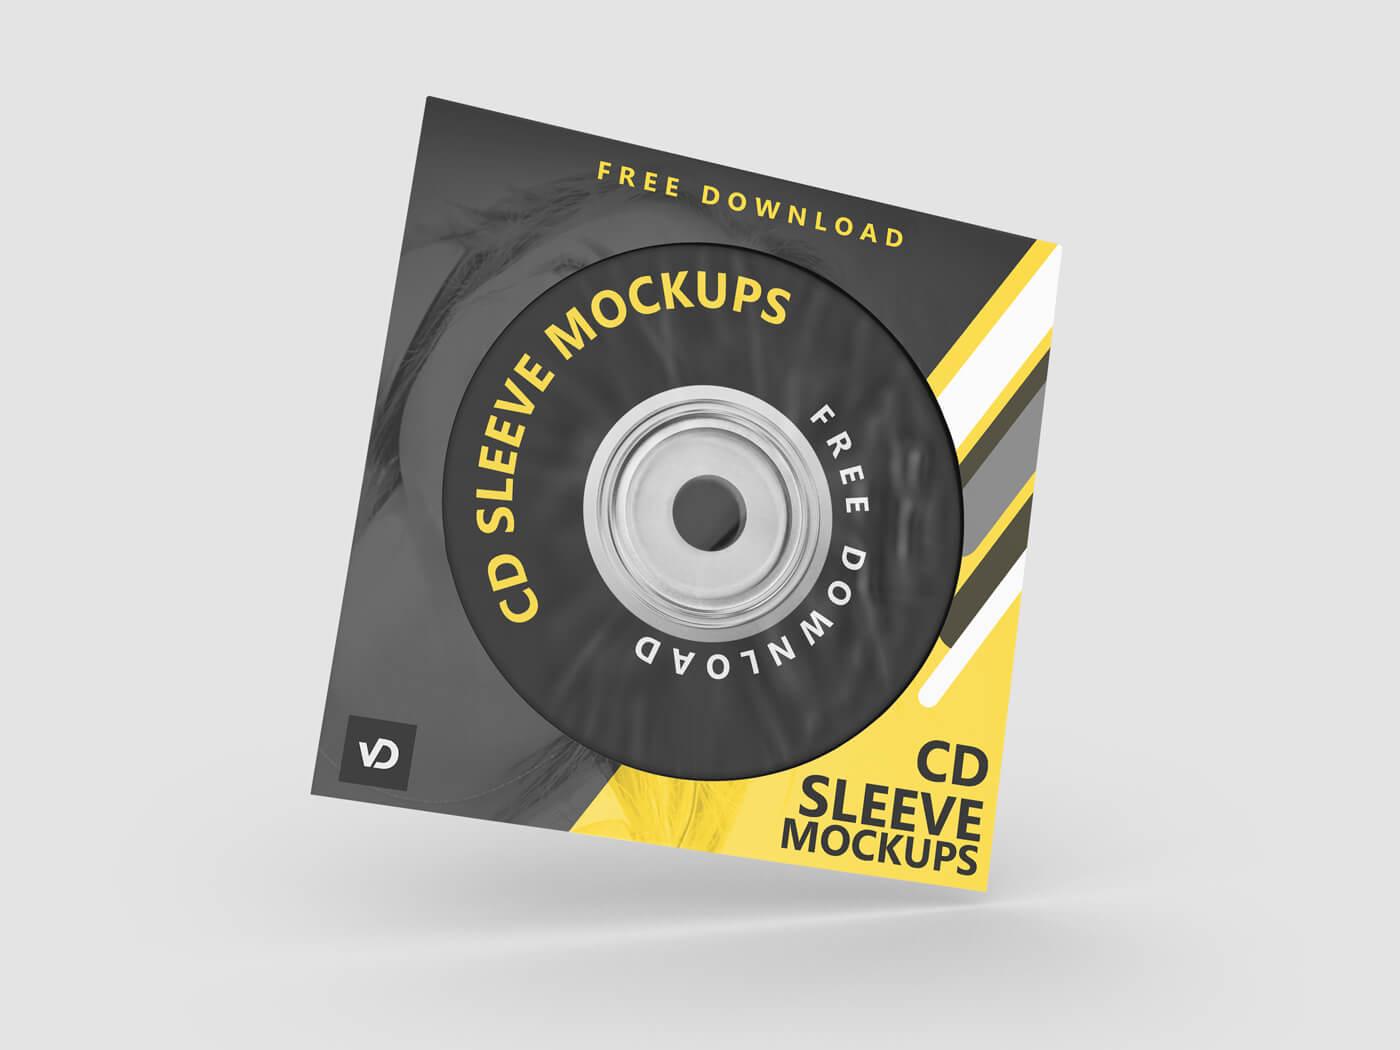 CD Sleeve Mockup 04